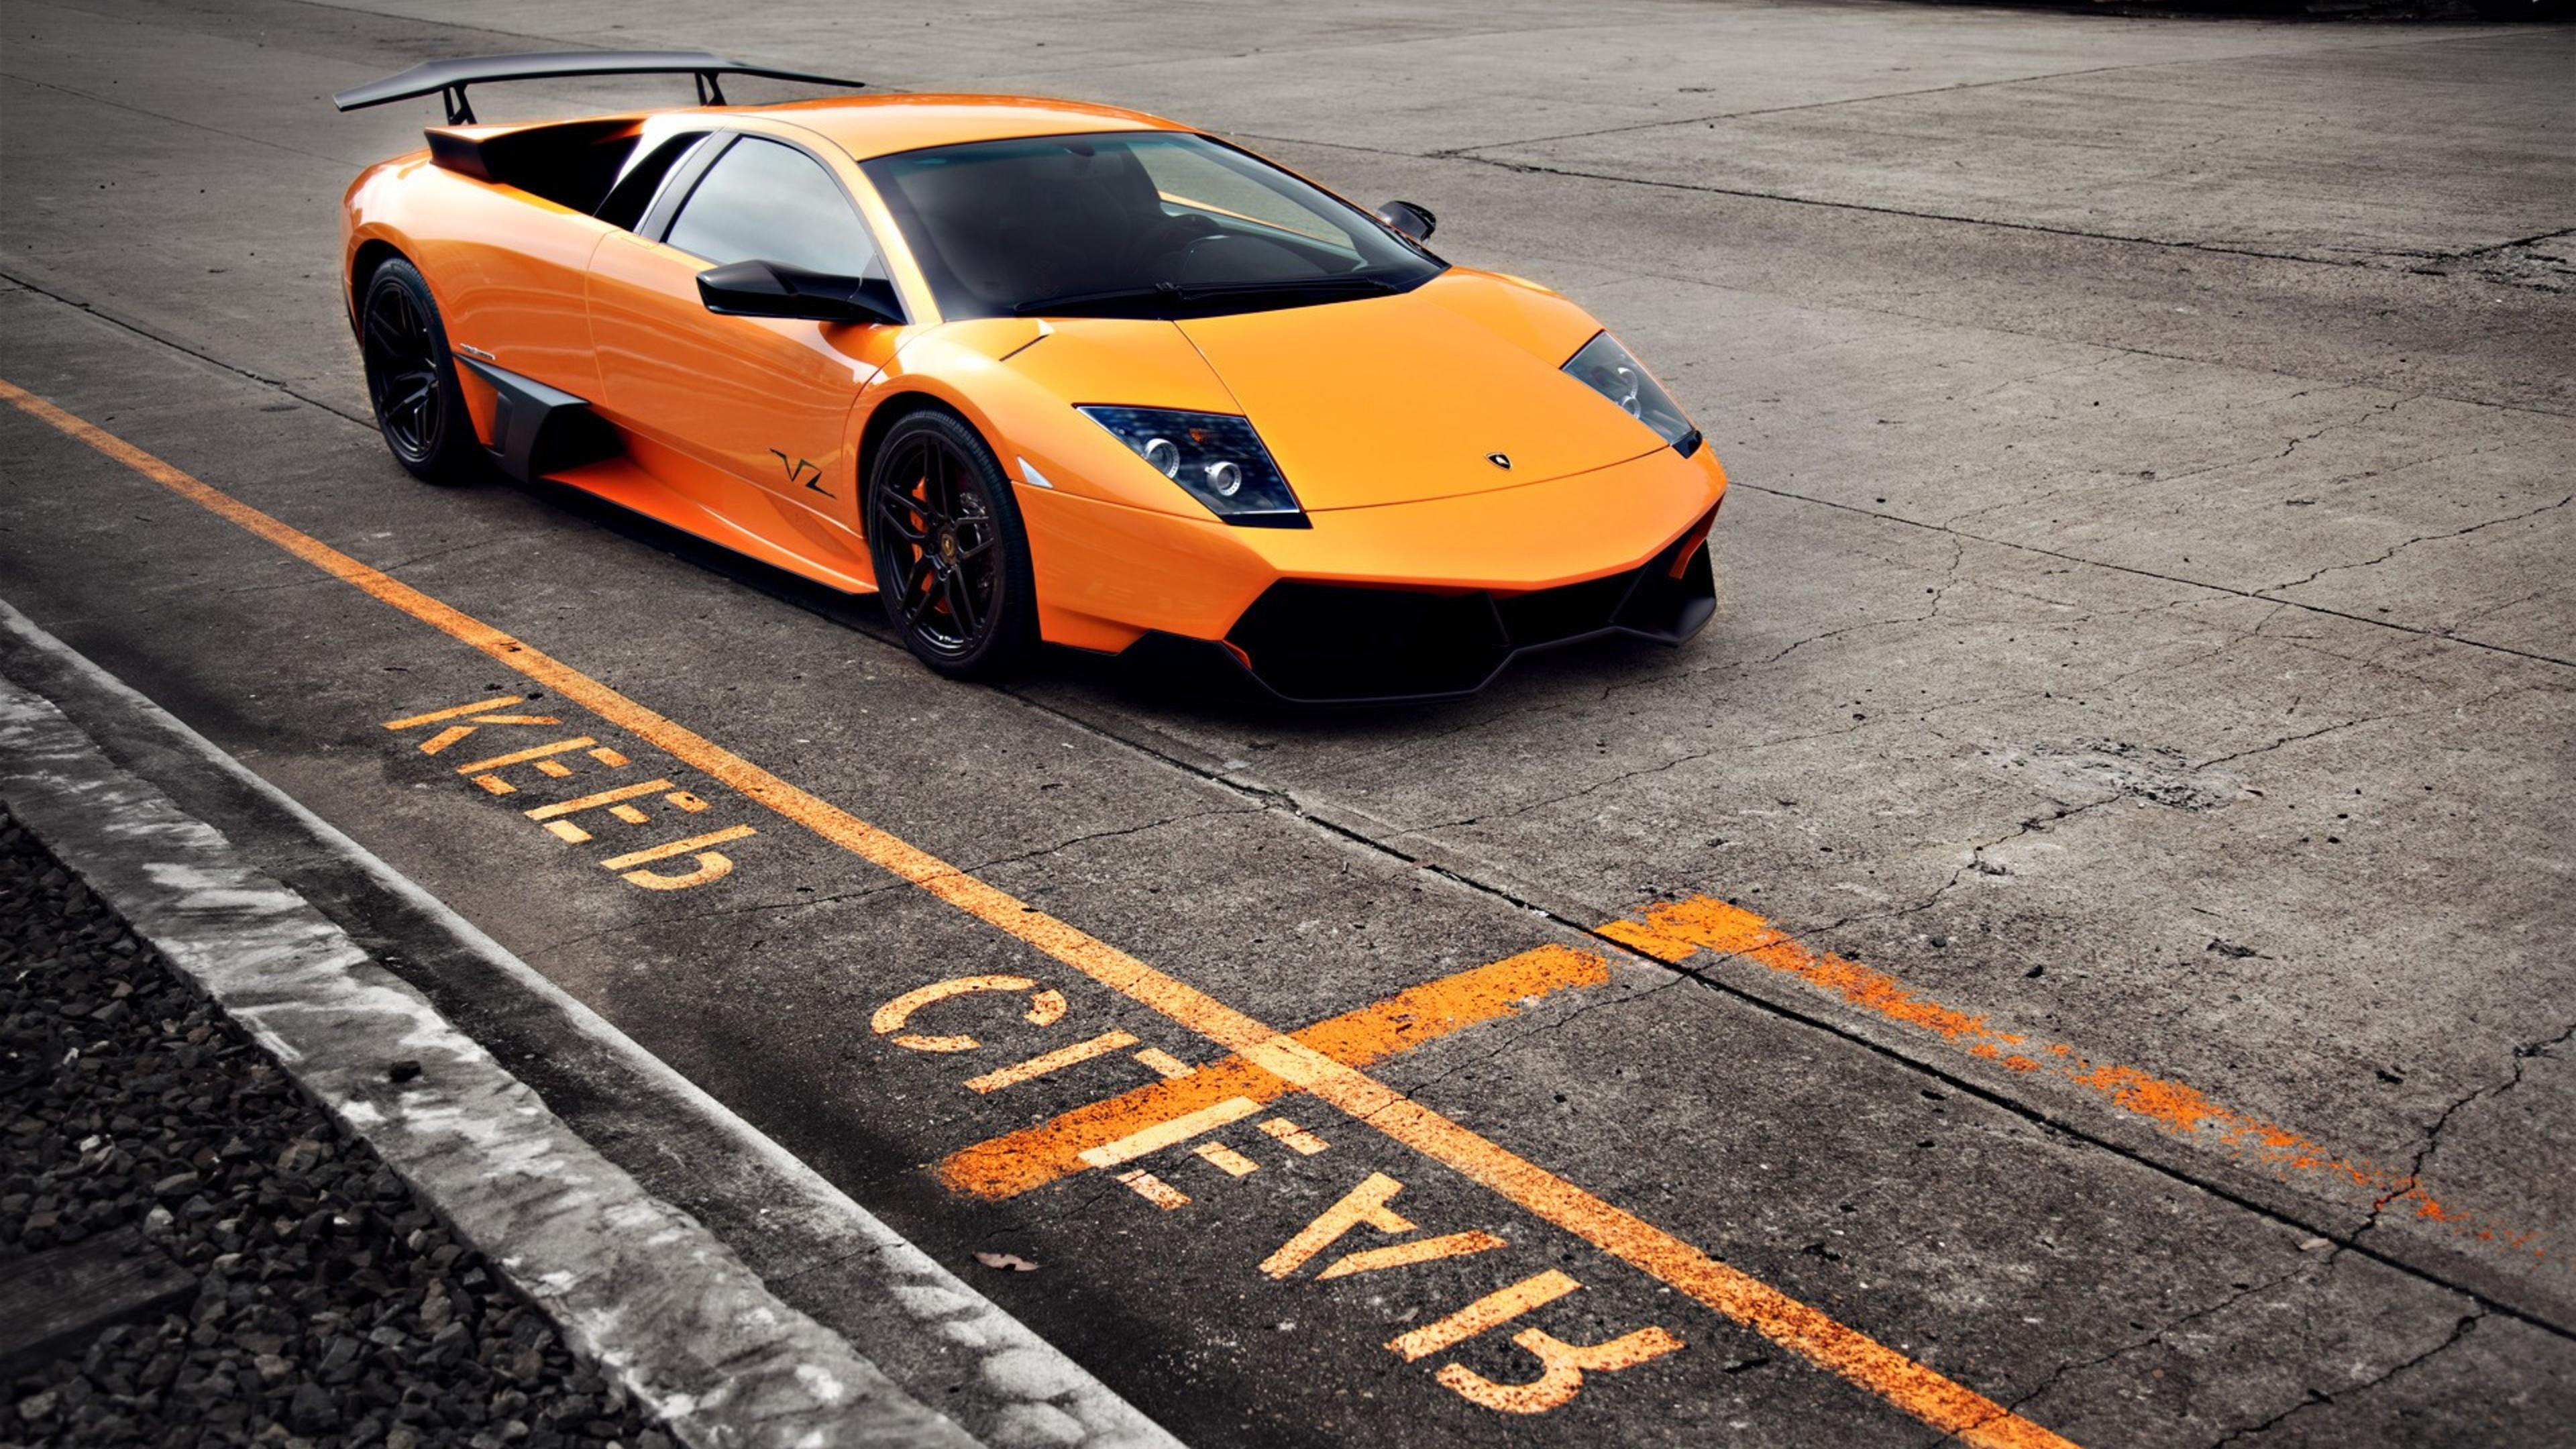 Awesome Lamborghini Murcielago LP670 HD